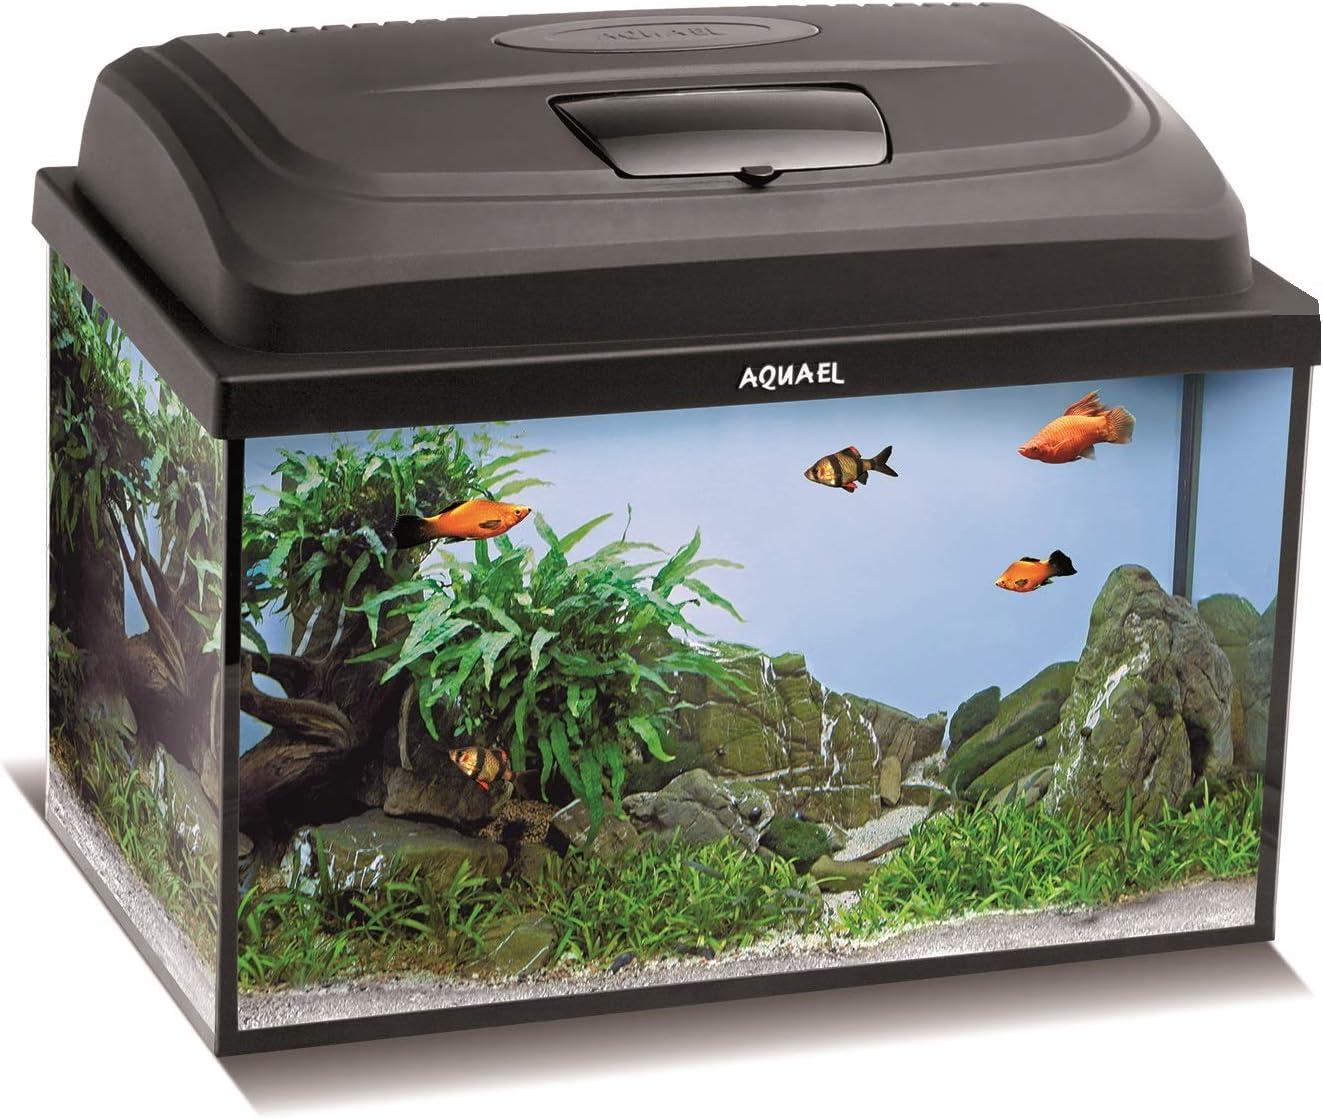 Aquael Set de Acuario Classic LT, Incluye Cubierta, Filtro, Calentador, iluminación LED (40 x 25 x 25 cm, Rectangular)